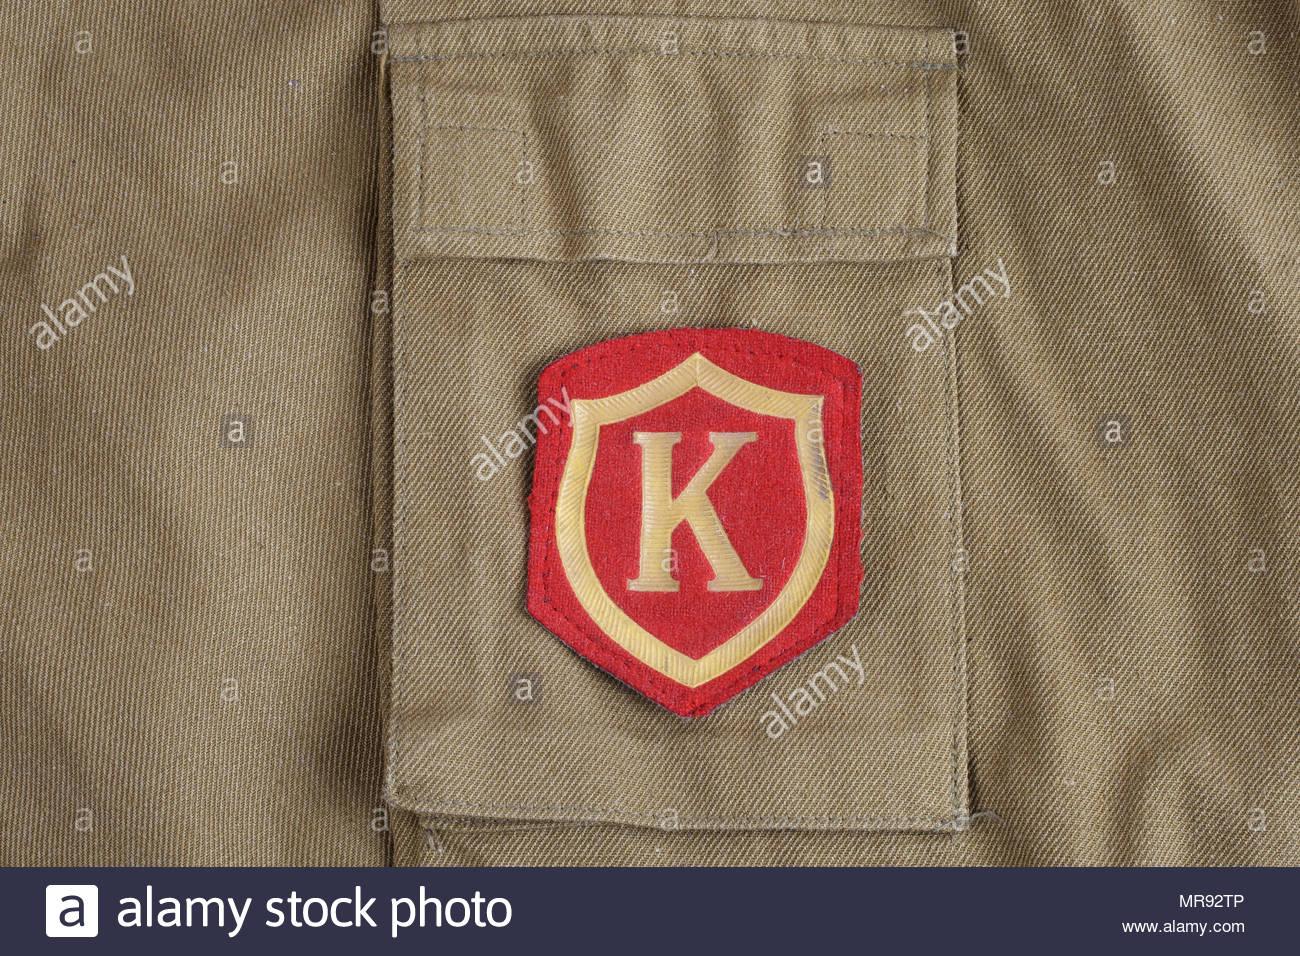 Soviet Army Commandant shoulder patch on khaki uniform background 1300x956